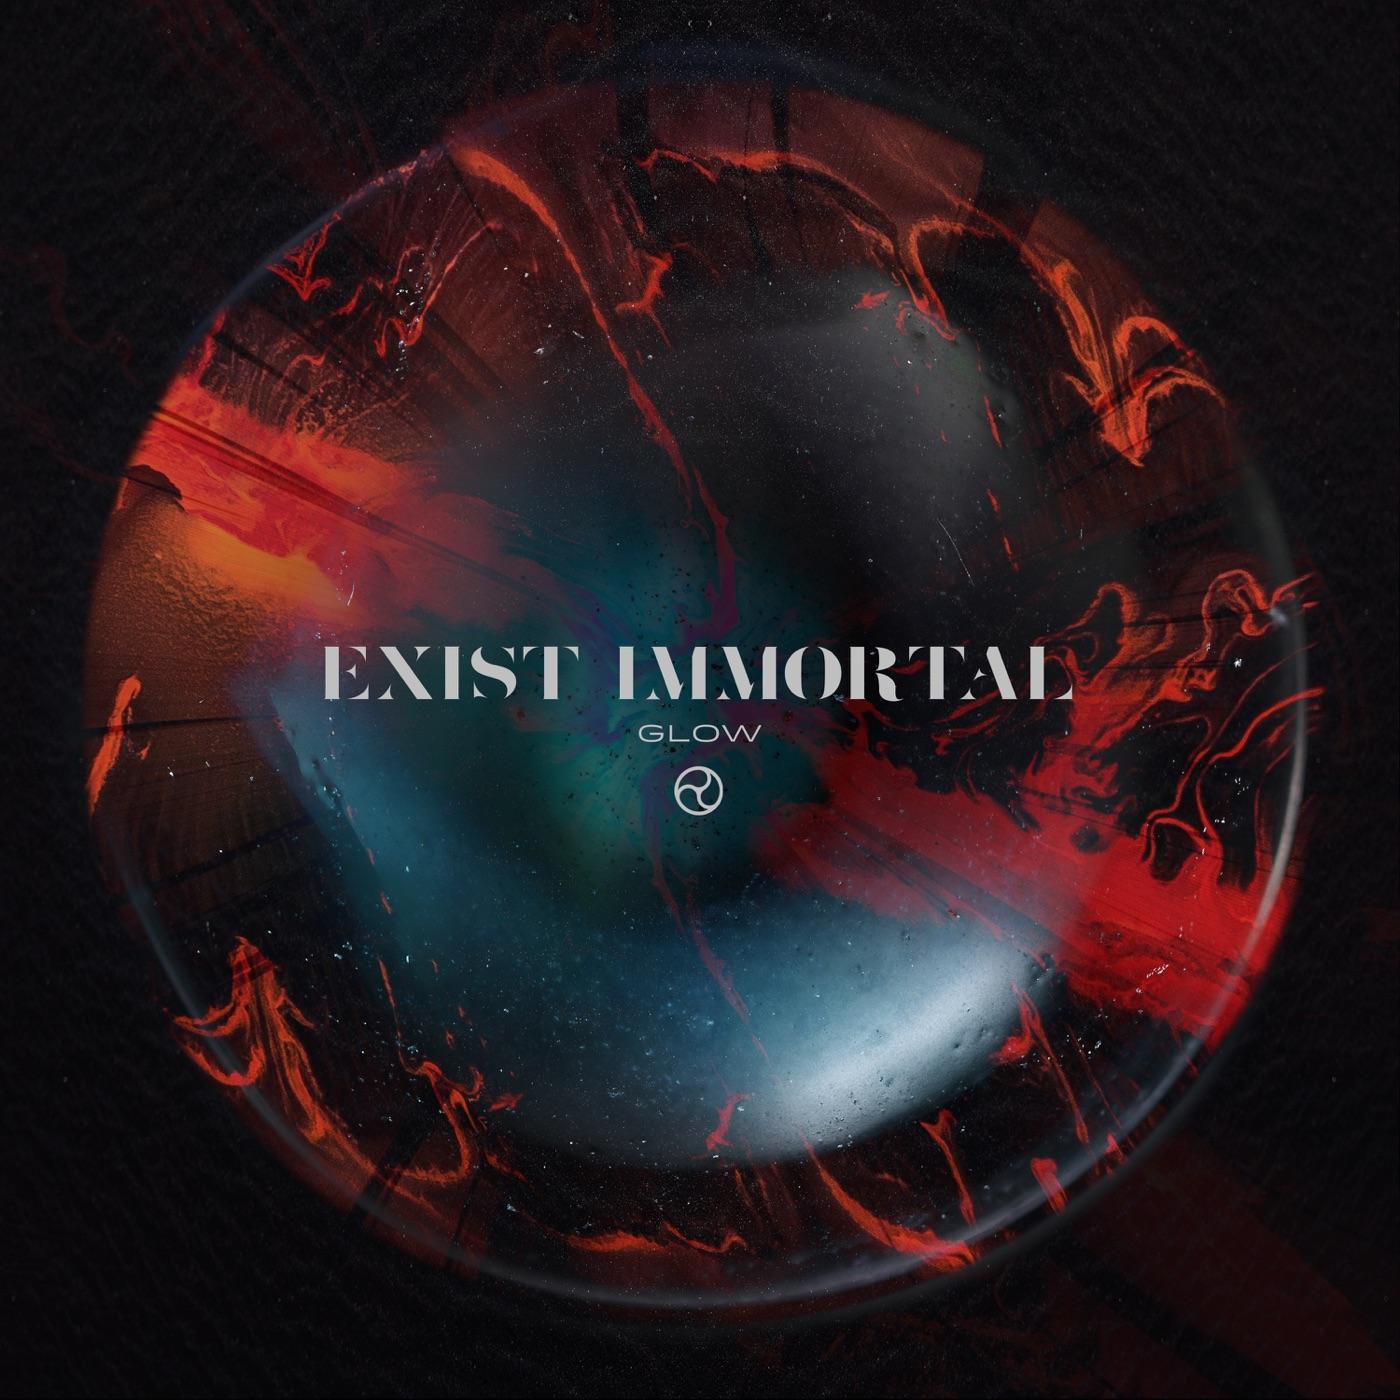 Exist Immortal - Glow [Single] (2019)